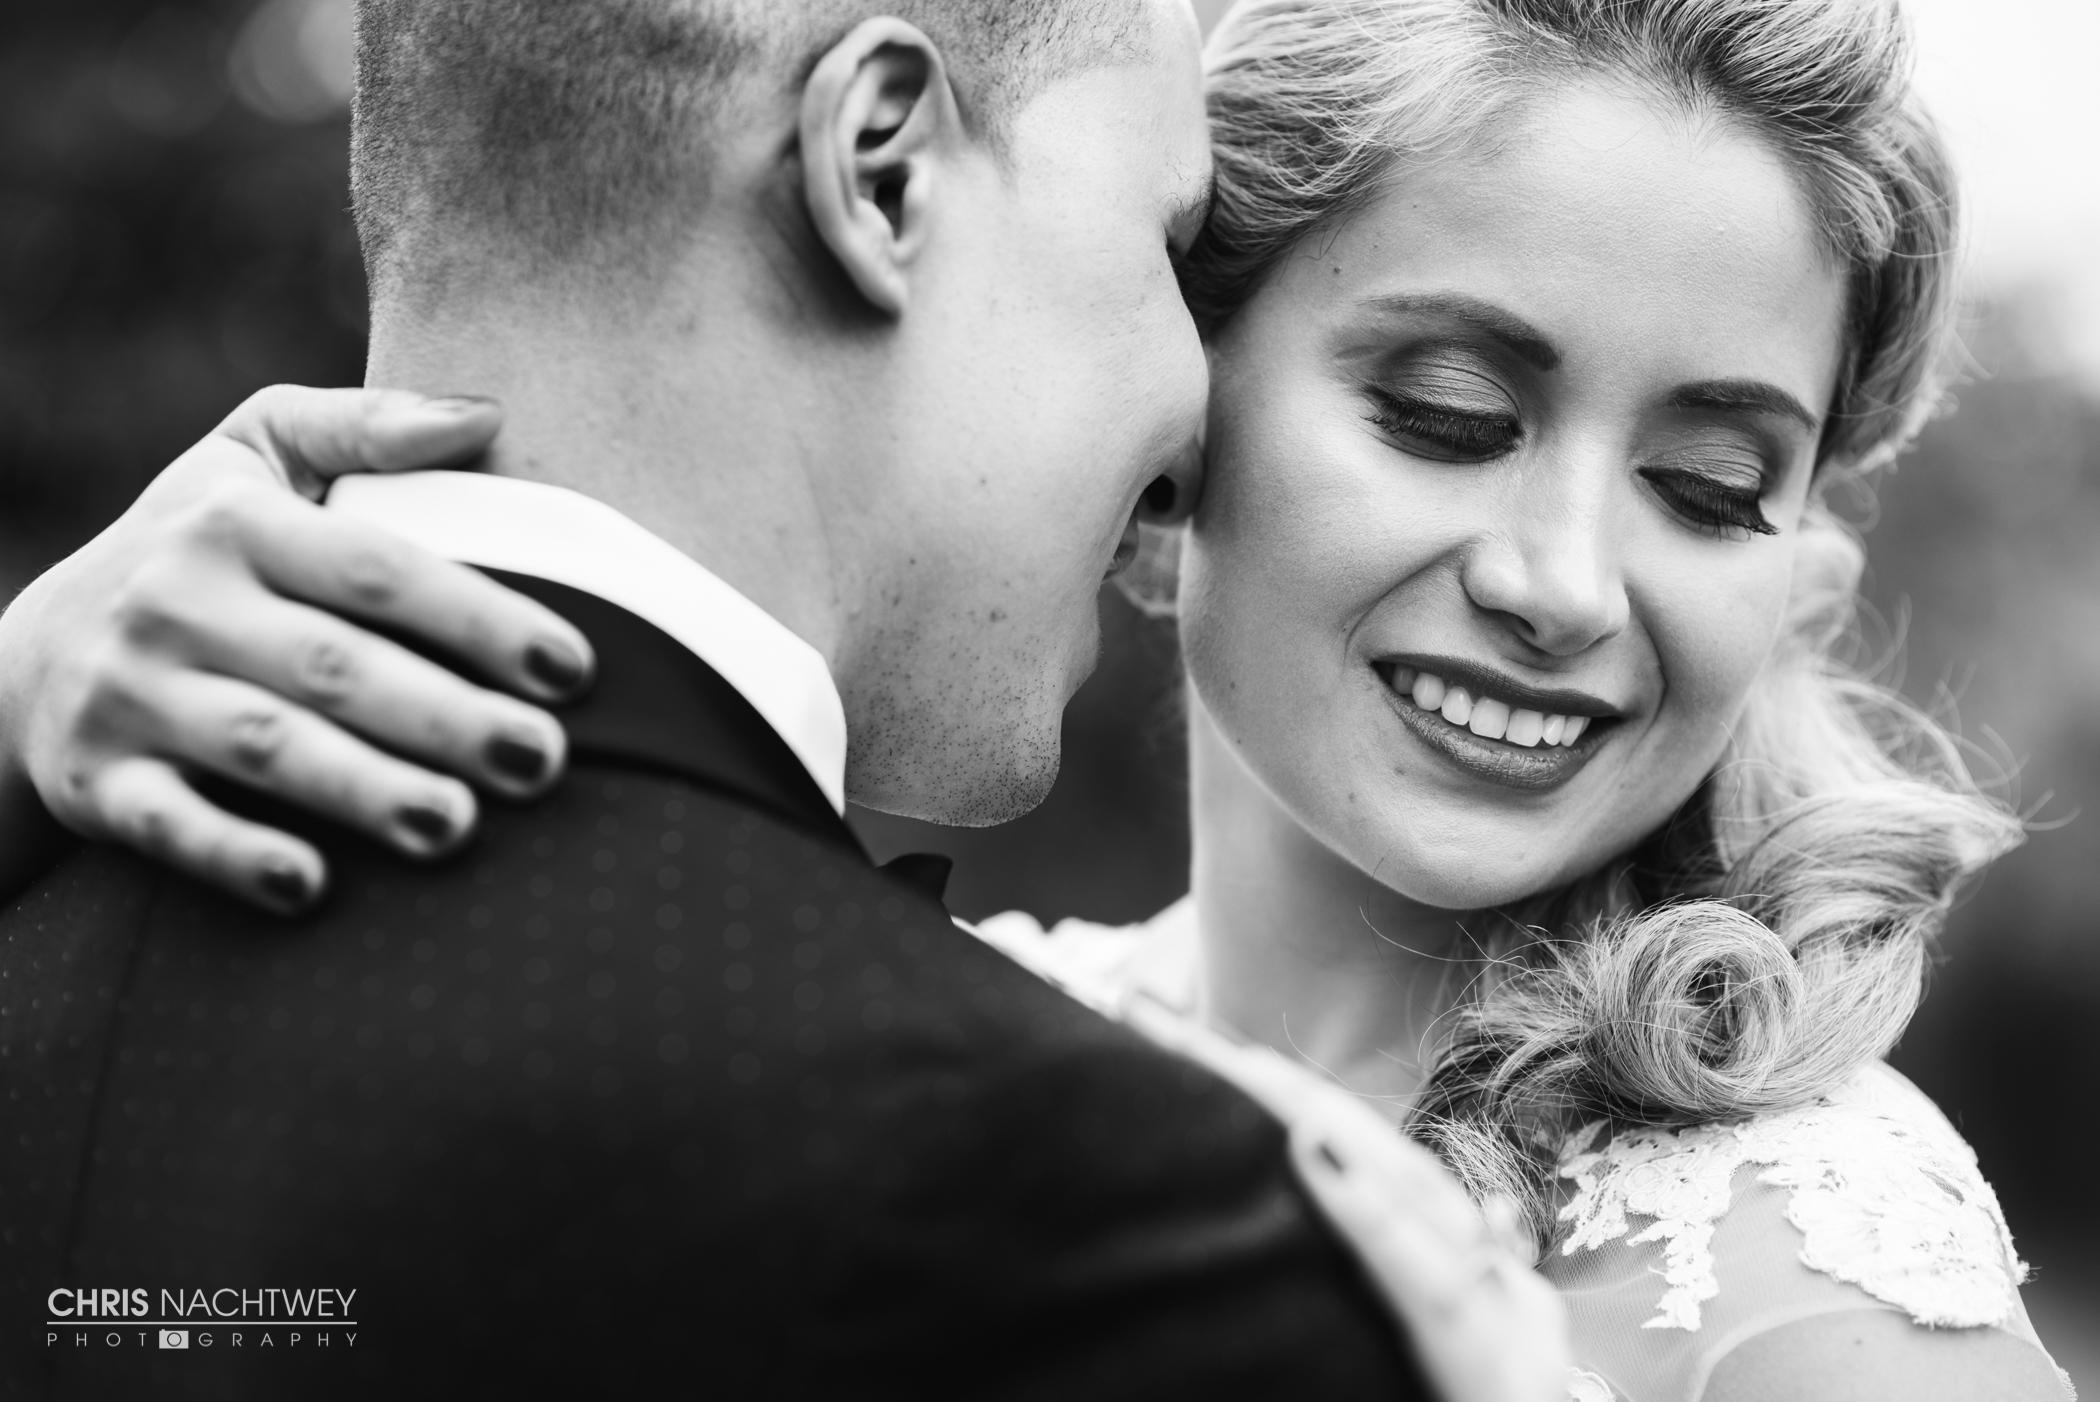 wedding-saltwater-farm-vineyard-photos-stonington-ct-chris-nachtwey-photography-2016-ana-austin-26.jpg